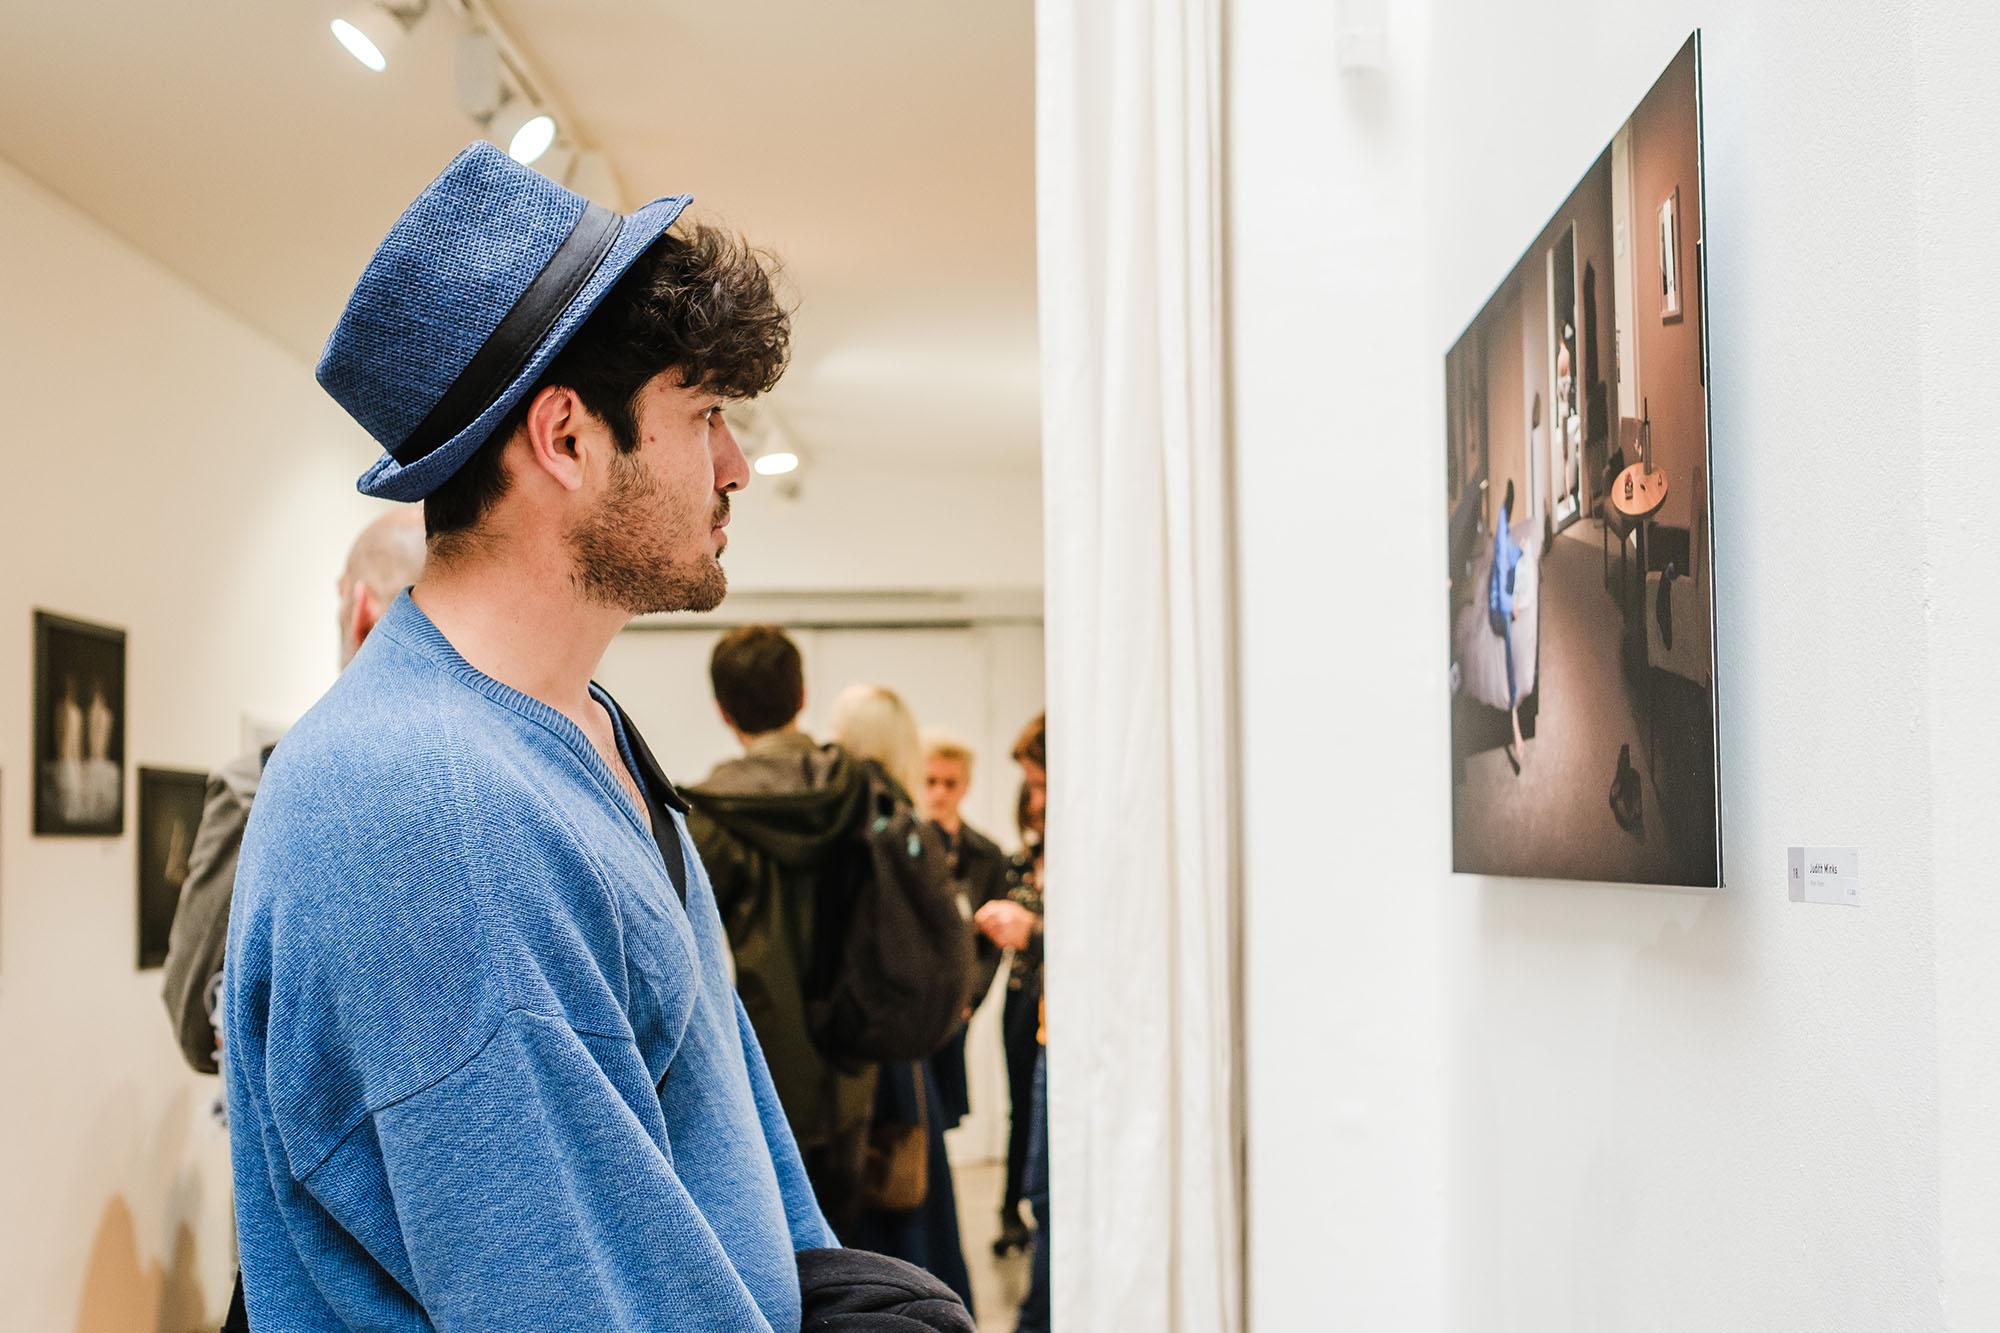 Imagenation photo exhibition